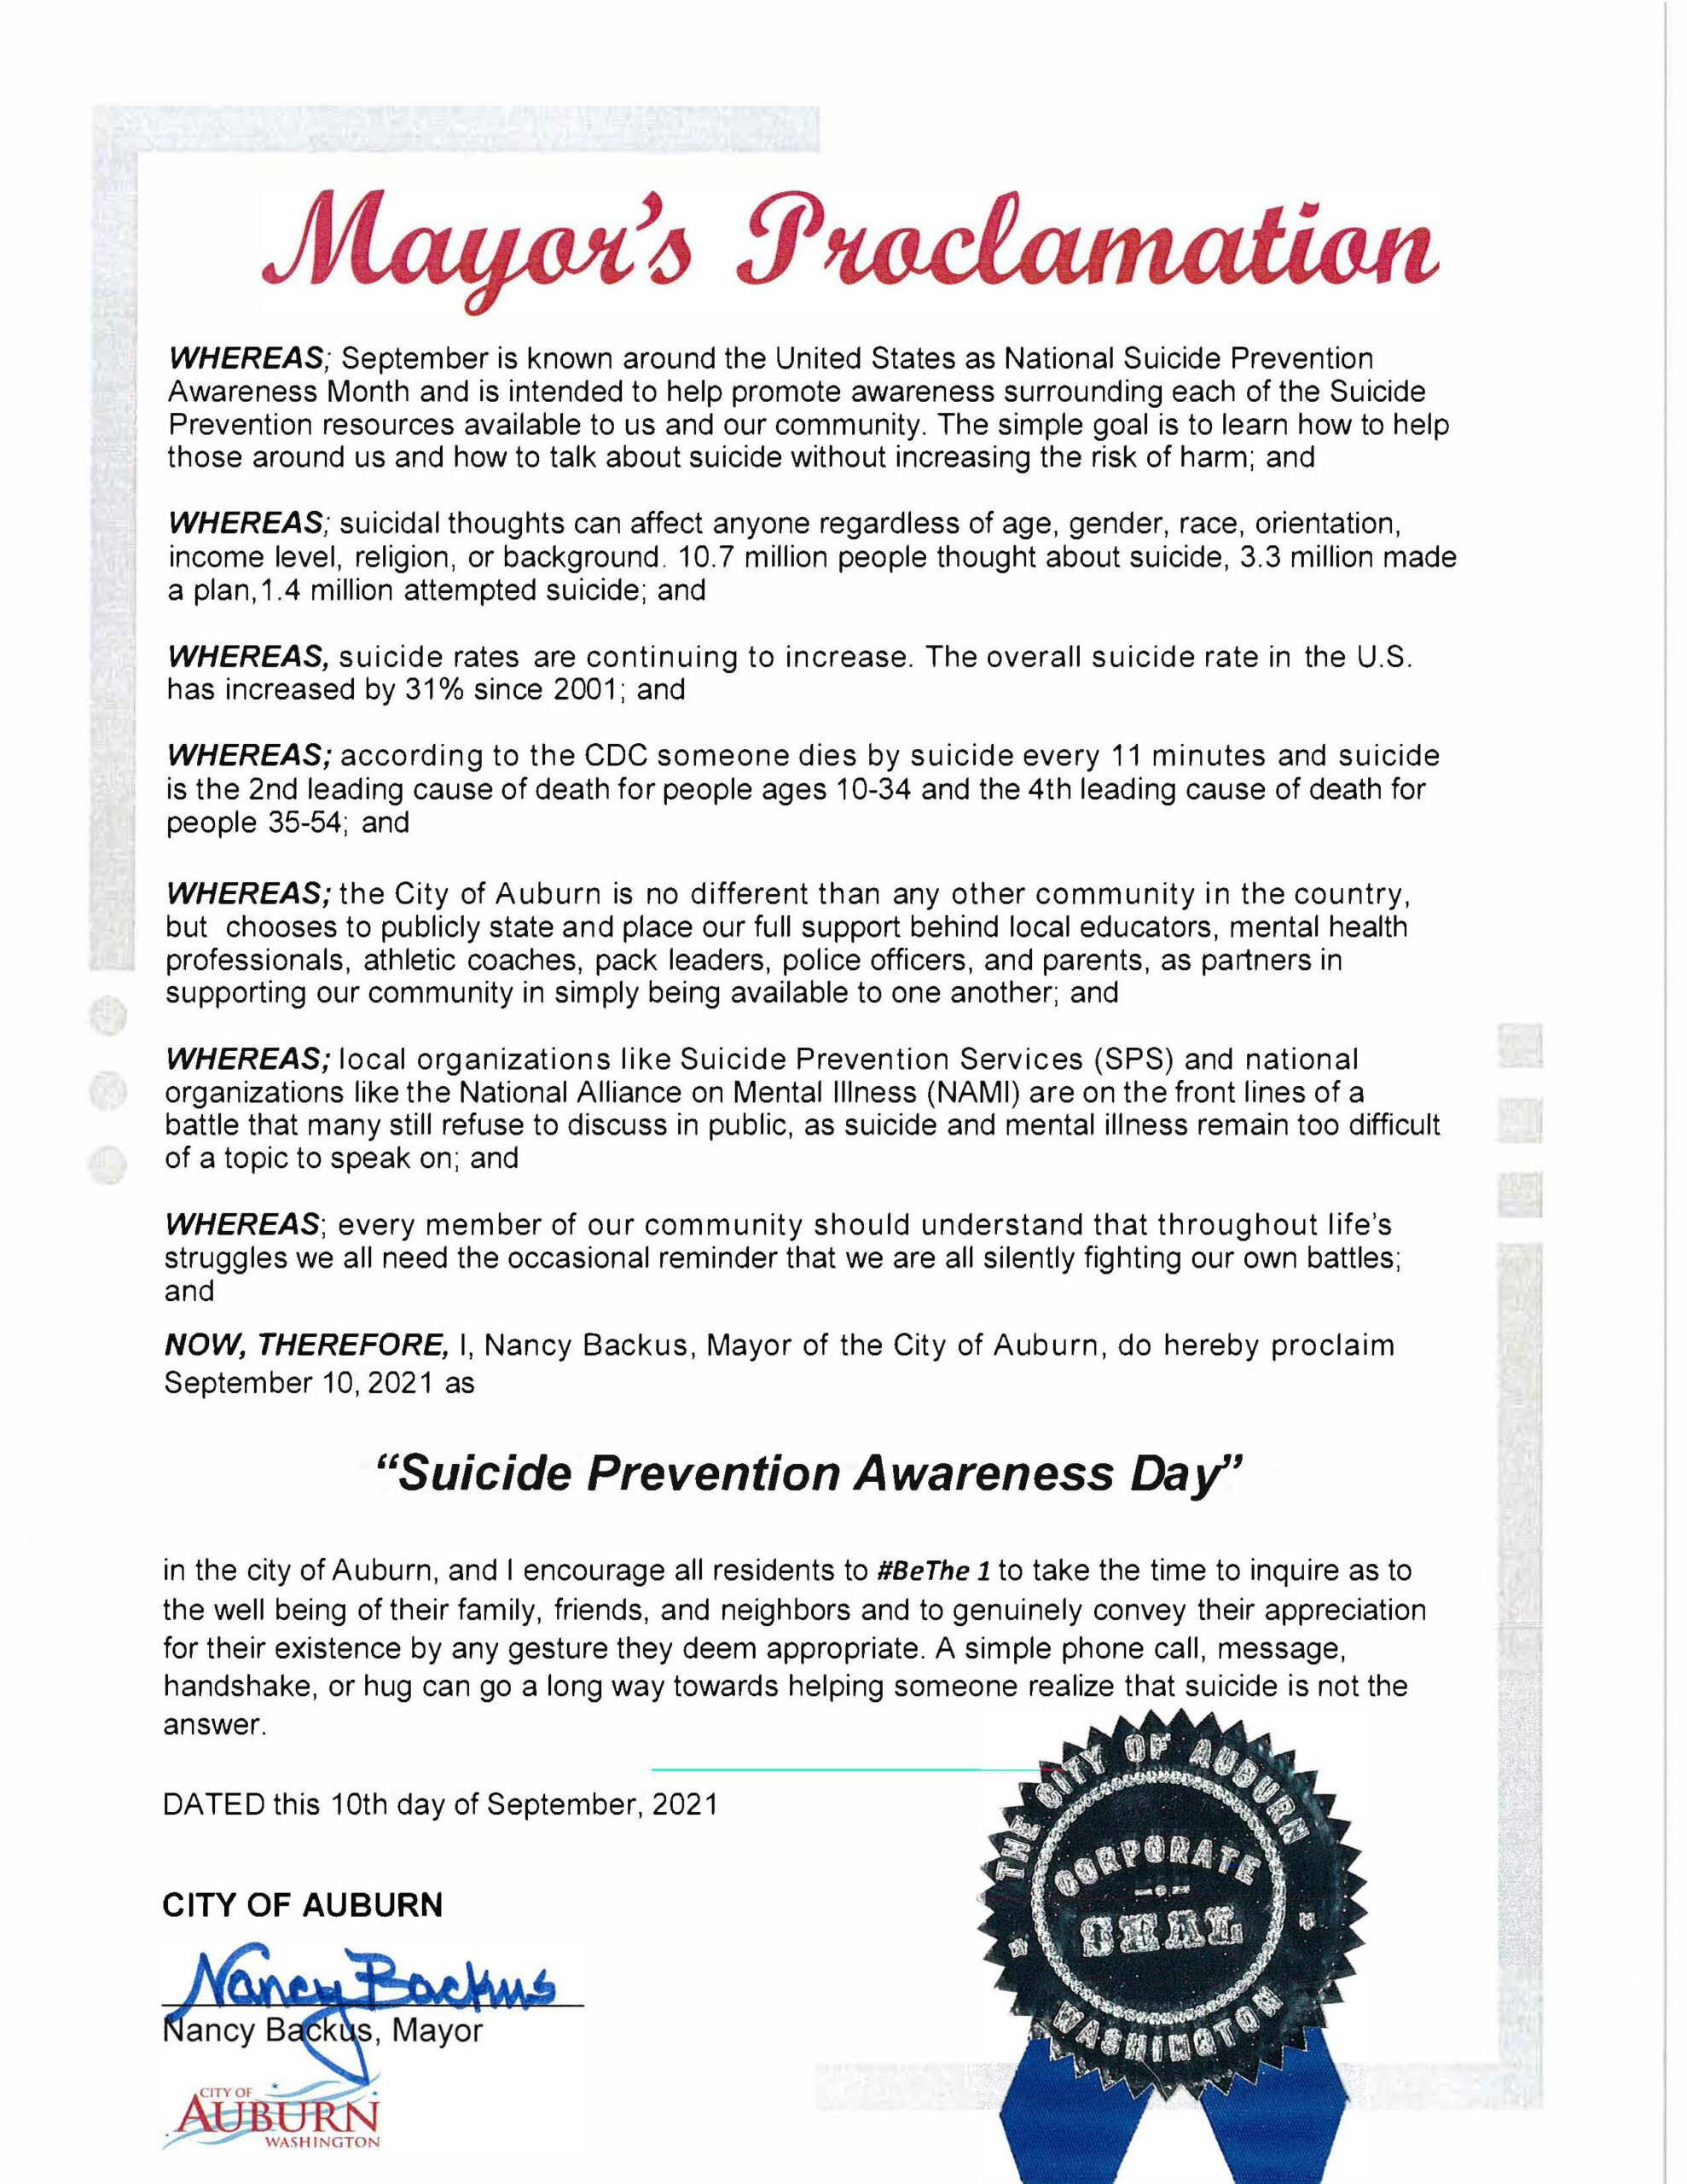 Mayor Nancy Backus' 2021 Suicide Prevention Day proclamation